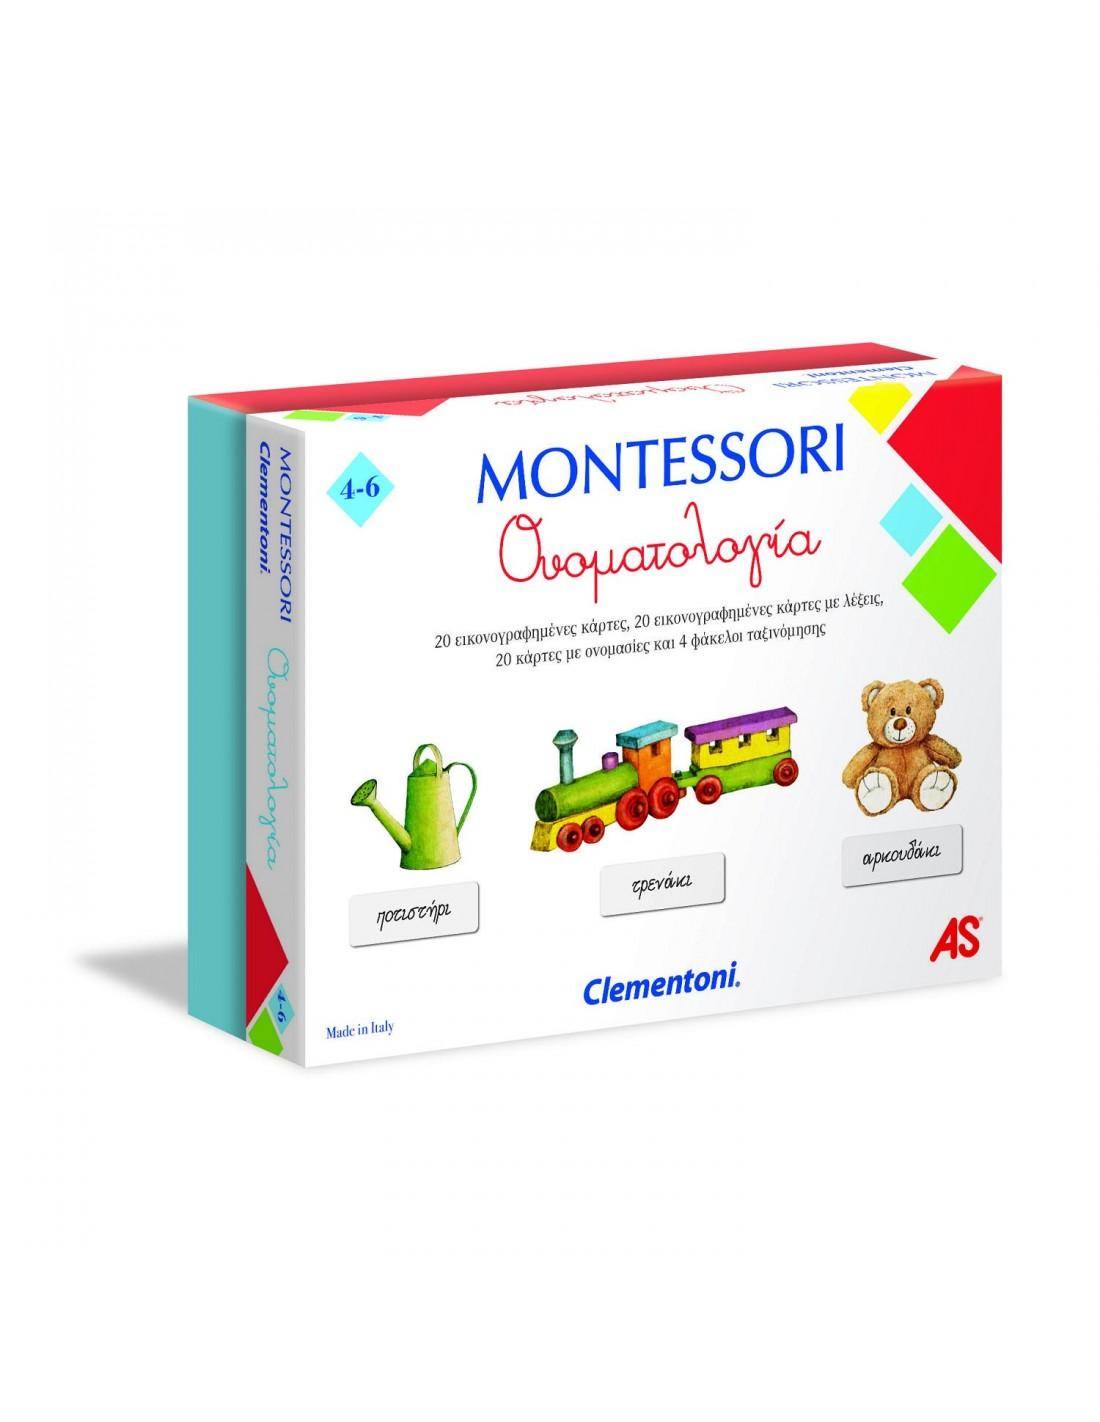 MONTESSORI-Η ΟΝΟΜΑΤΟΛΟΓΙΑ